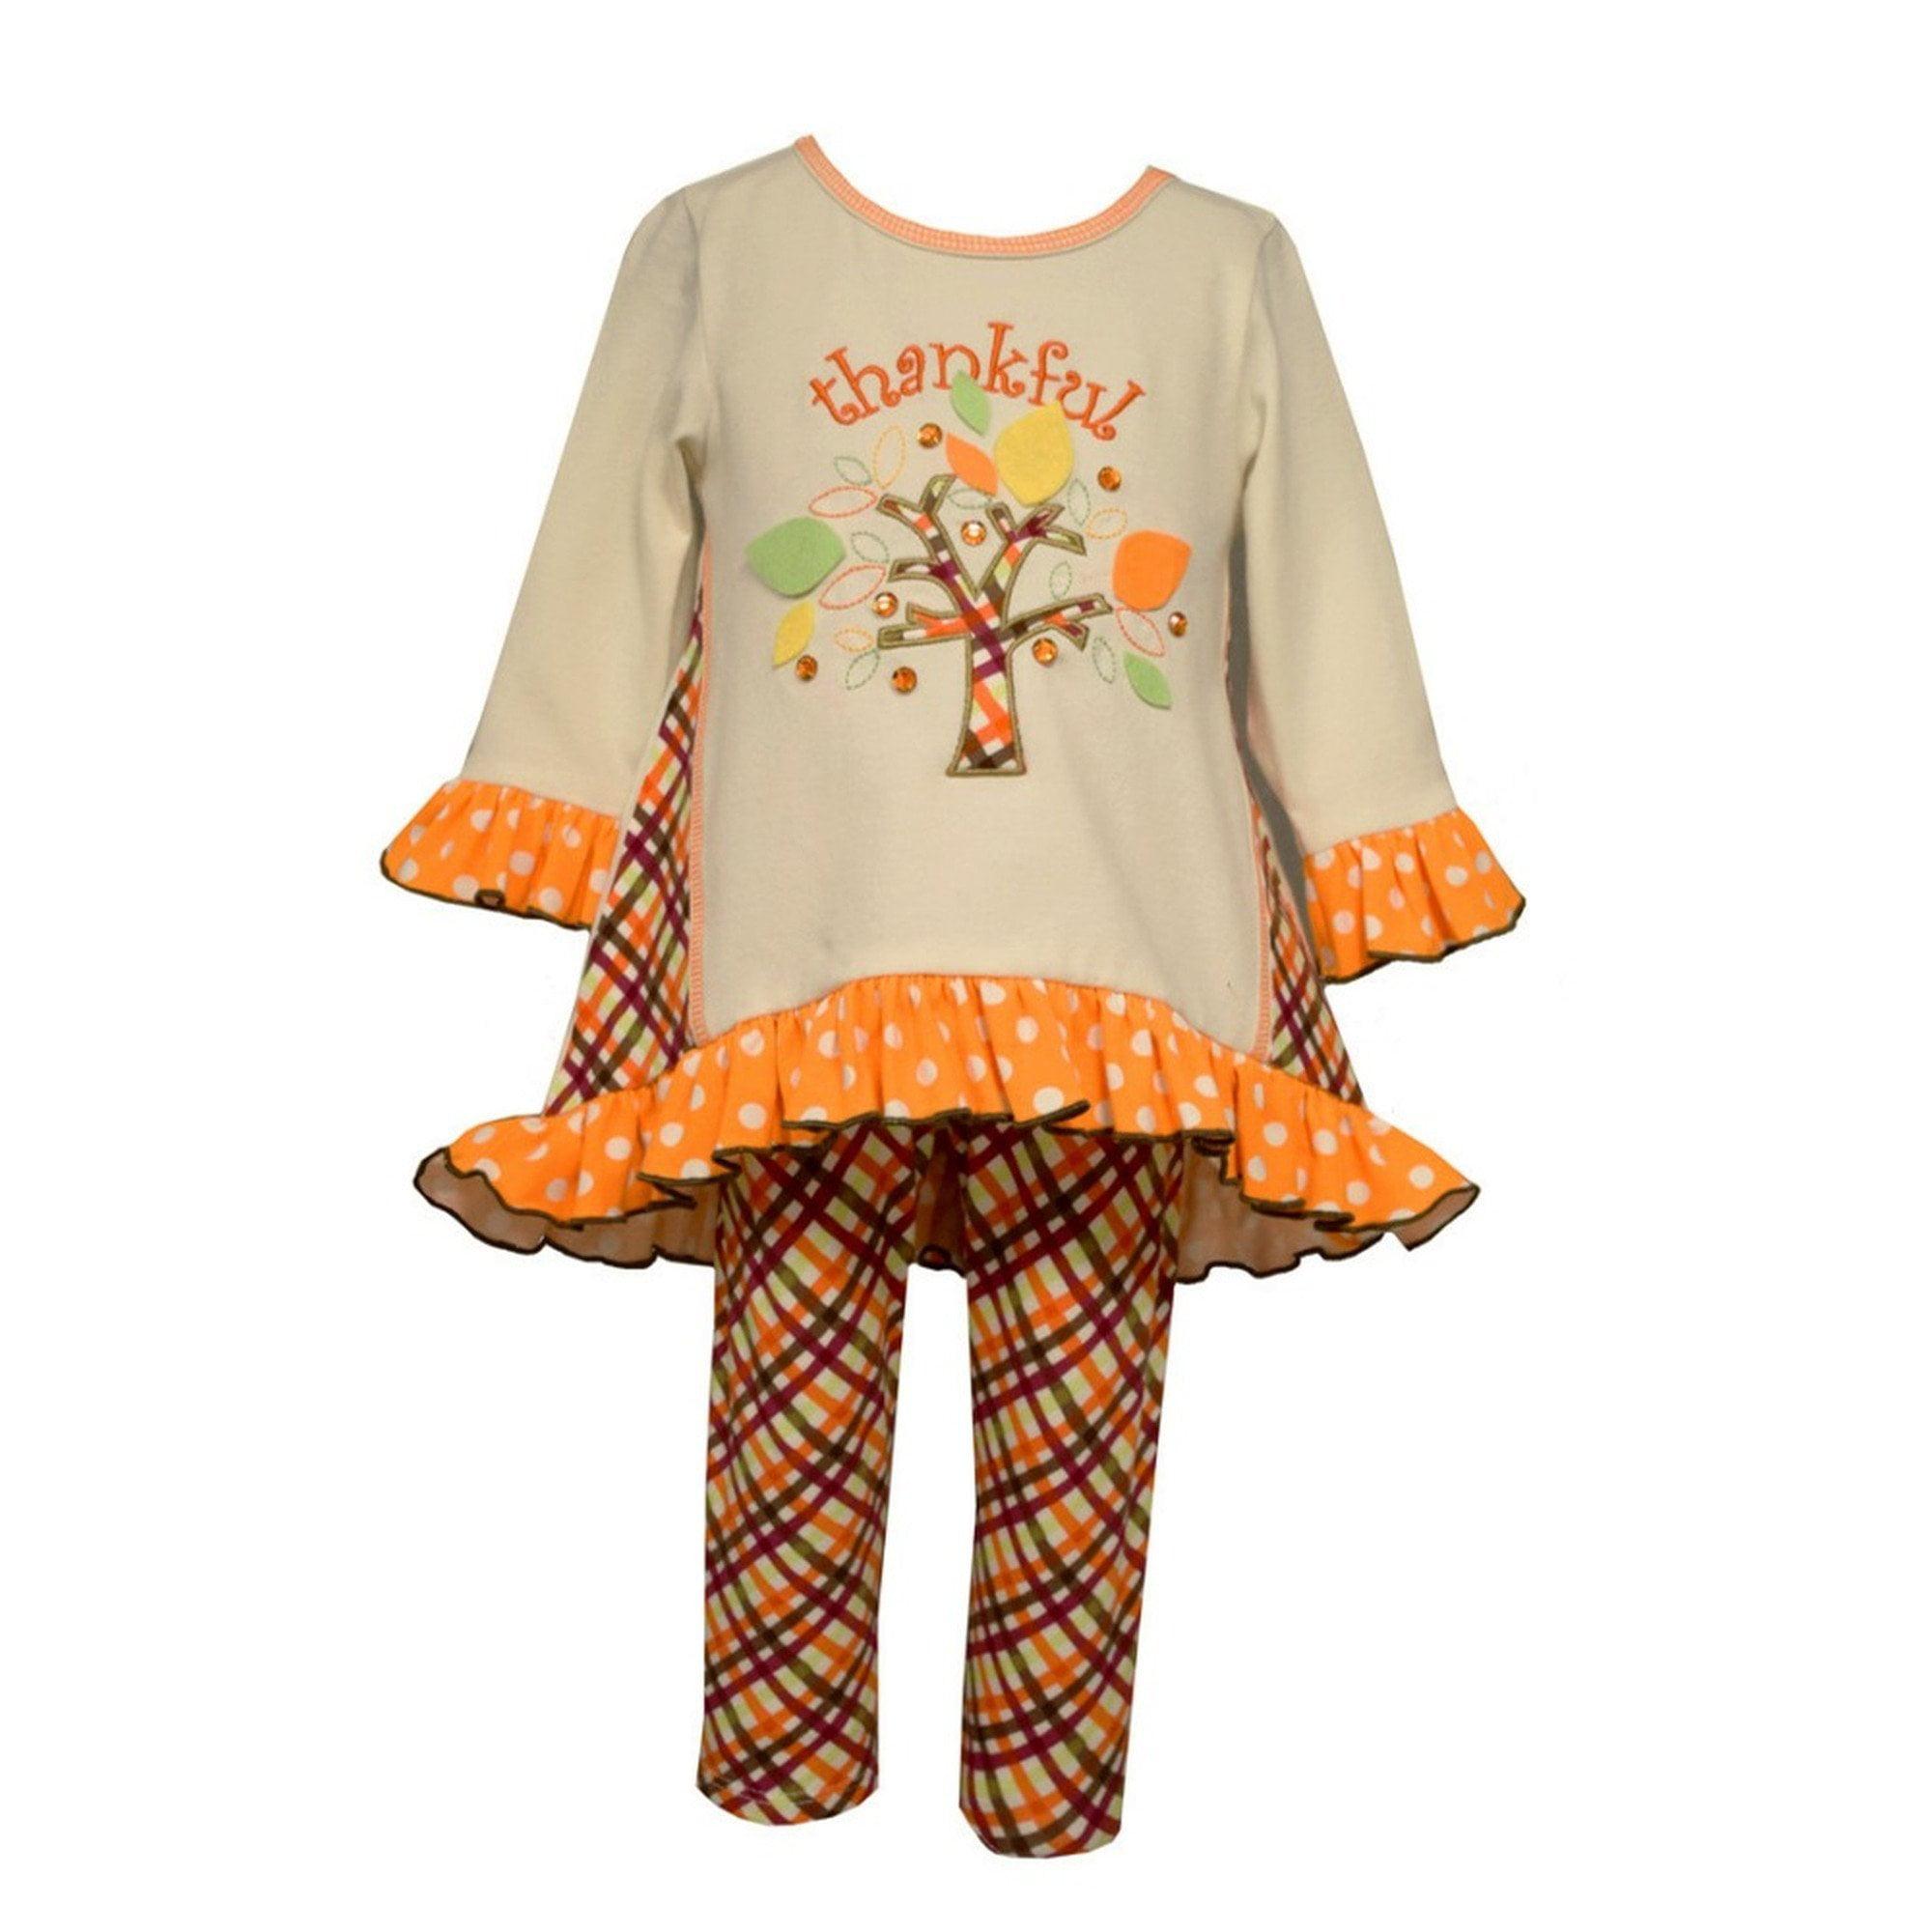 Bonnie Jean Thankful Knit Set, Ivory